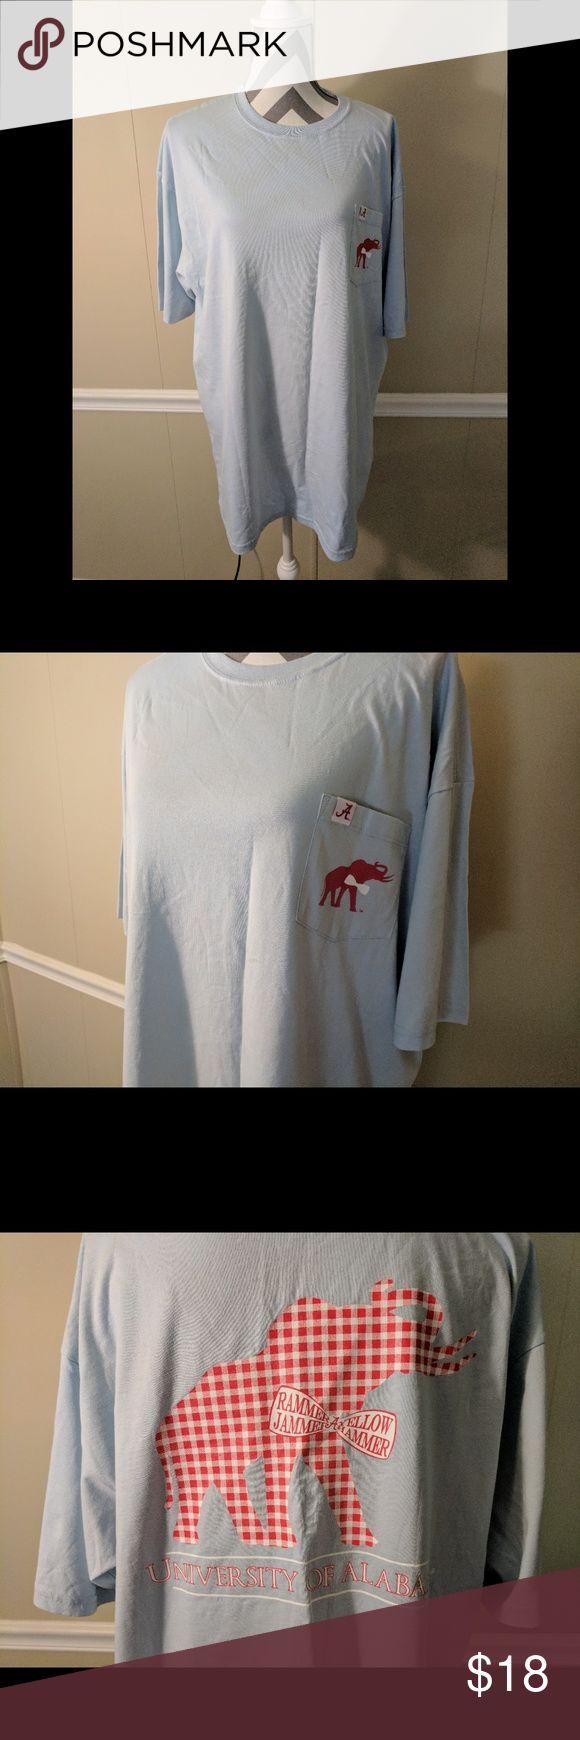 T shirt design huntsville al - University Of Alabama T Shirt Beautiful Light Blue University Of Alabama T Shirt